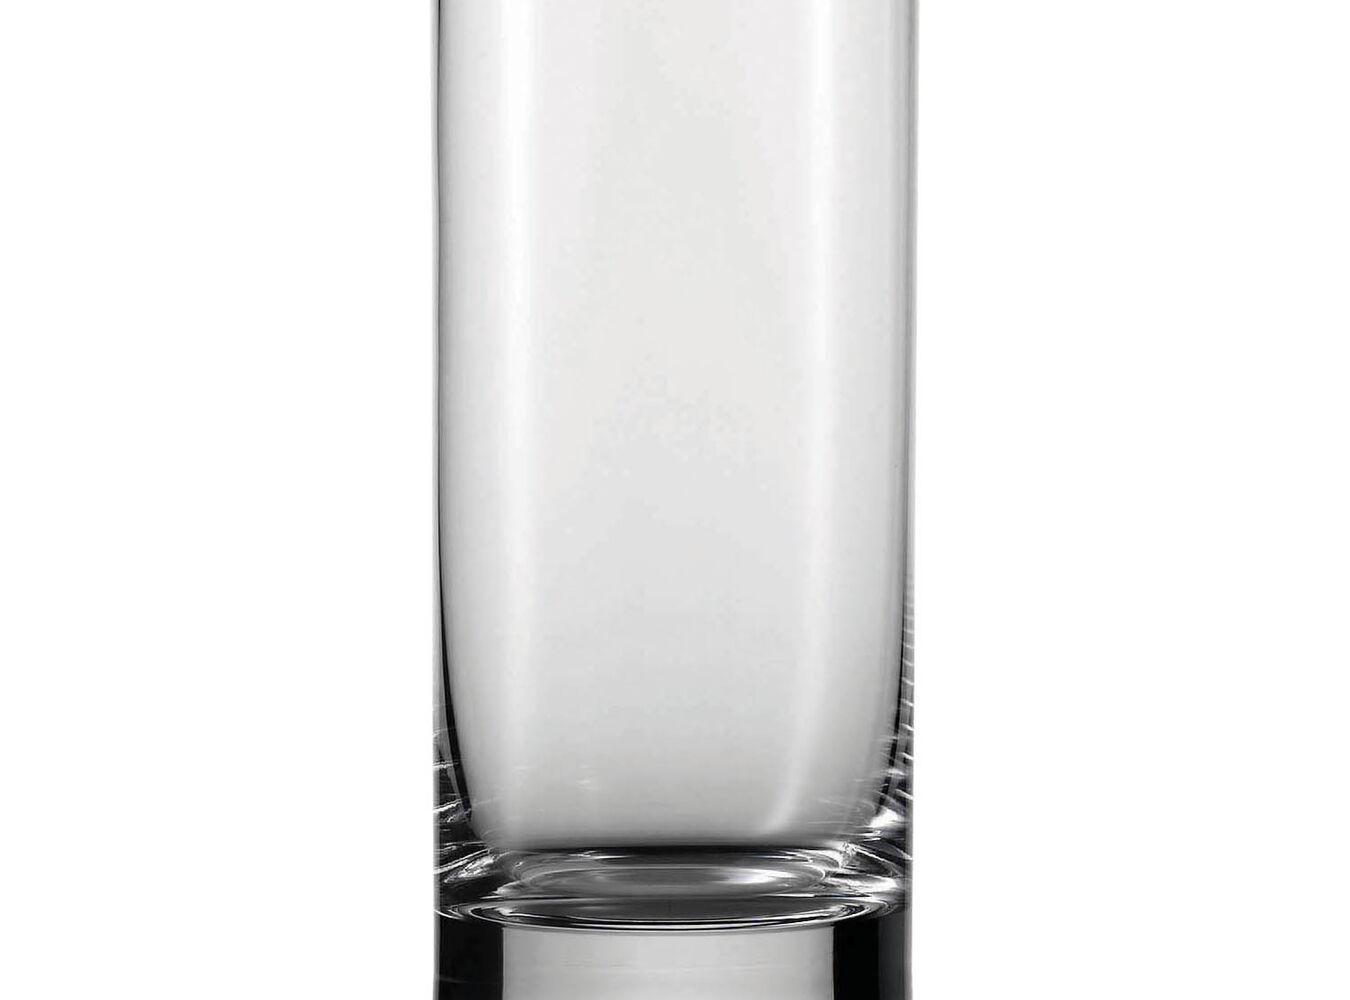 Schott Zwiesel Paris/Iceberg Ice Beverage Glasses, Set of 6 | Sur La Table